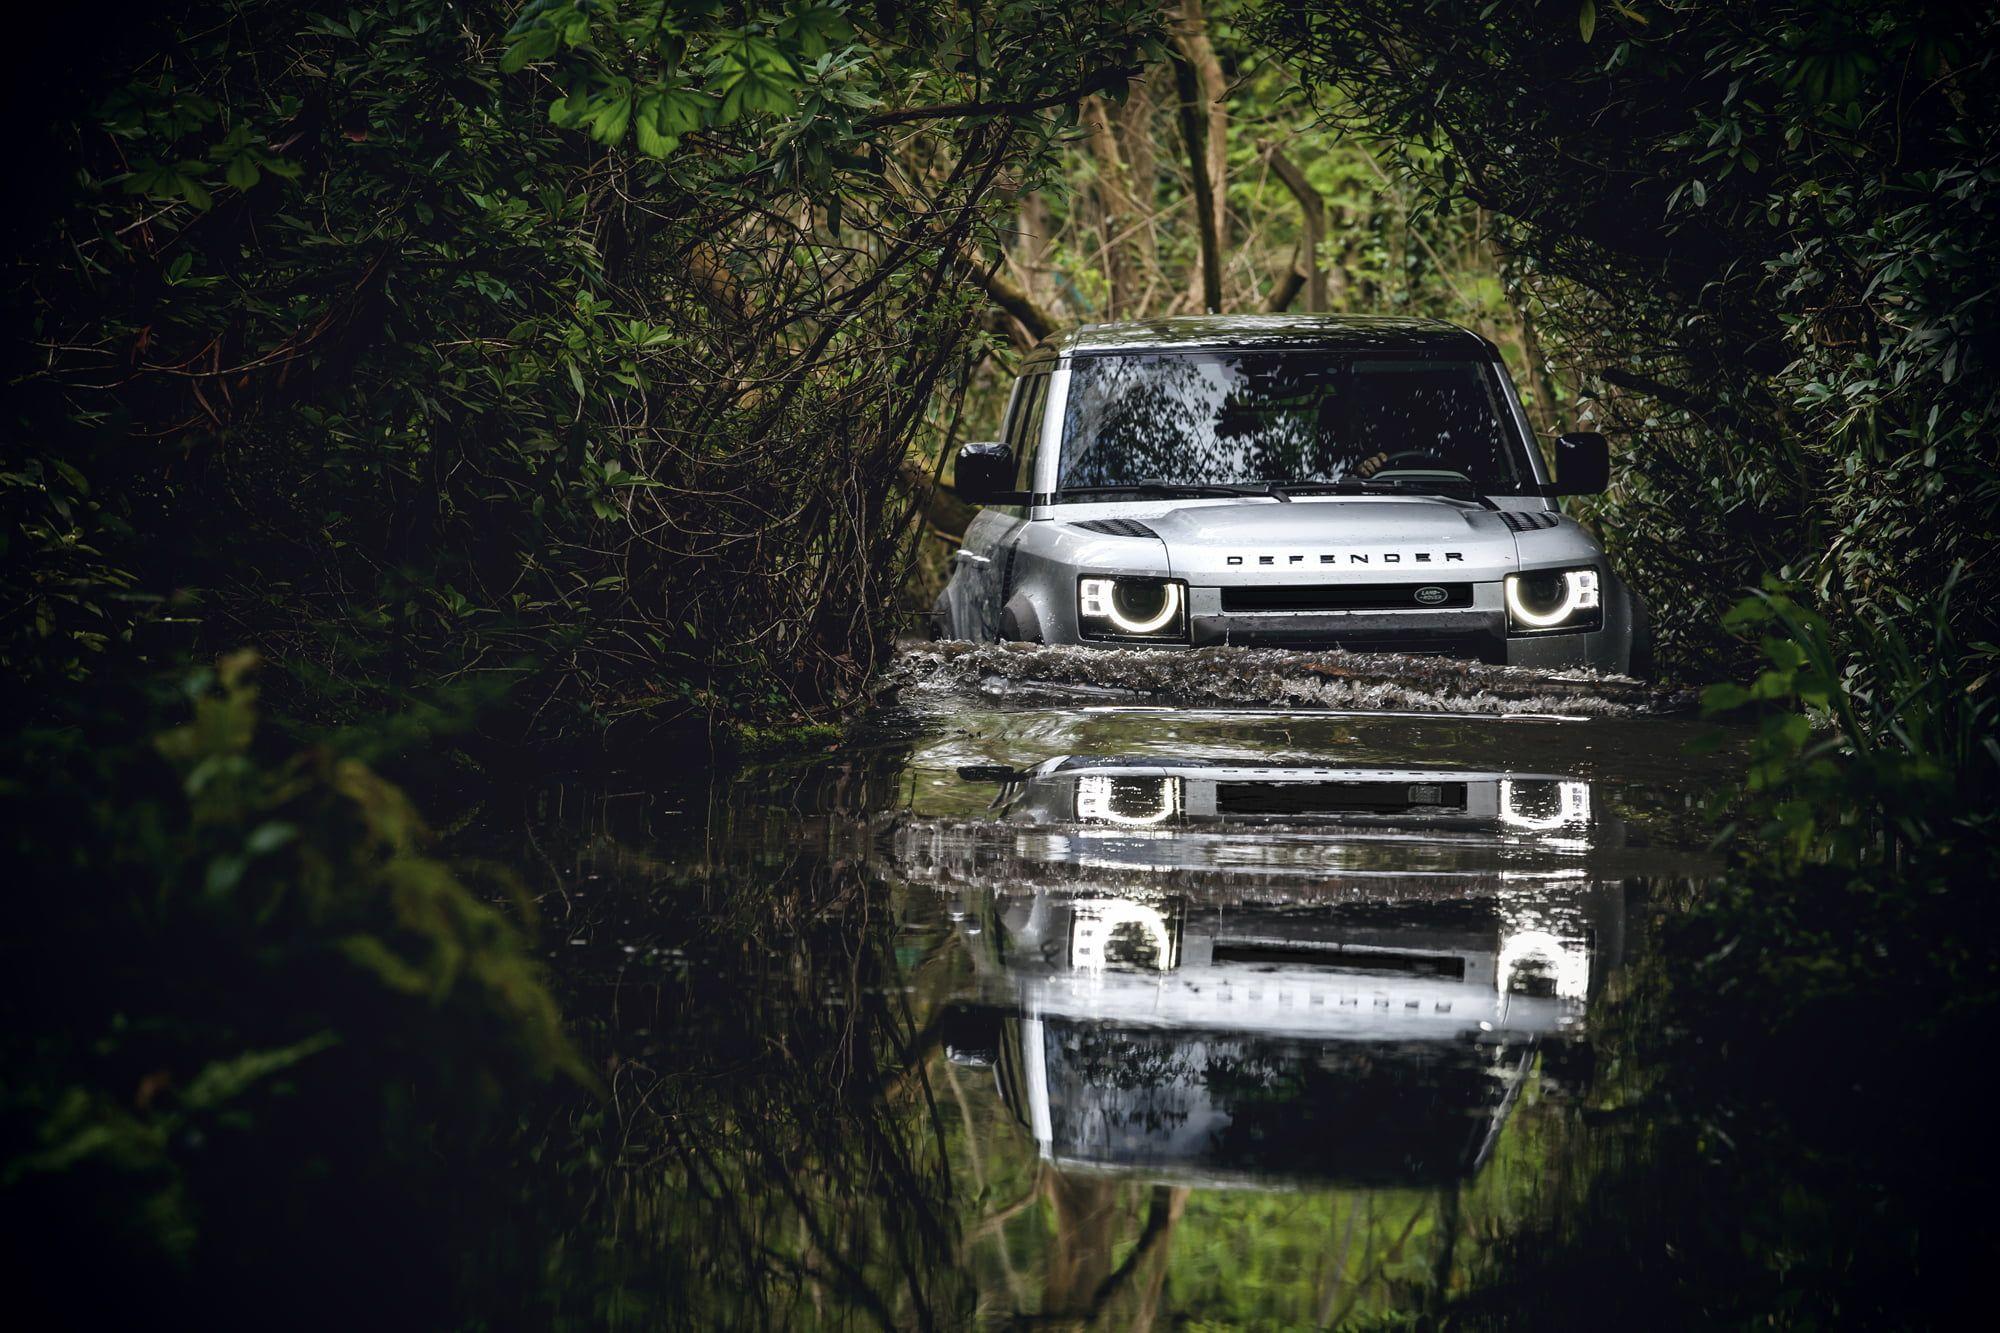 Land Rover Defender 2020 Adventure Time Forest Nature Water 1080p Wallpaper Hdwallpaper Desktop Land Rover Defender Land Rover New Defender